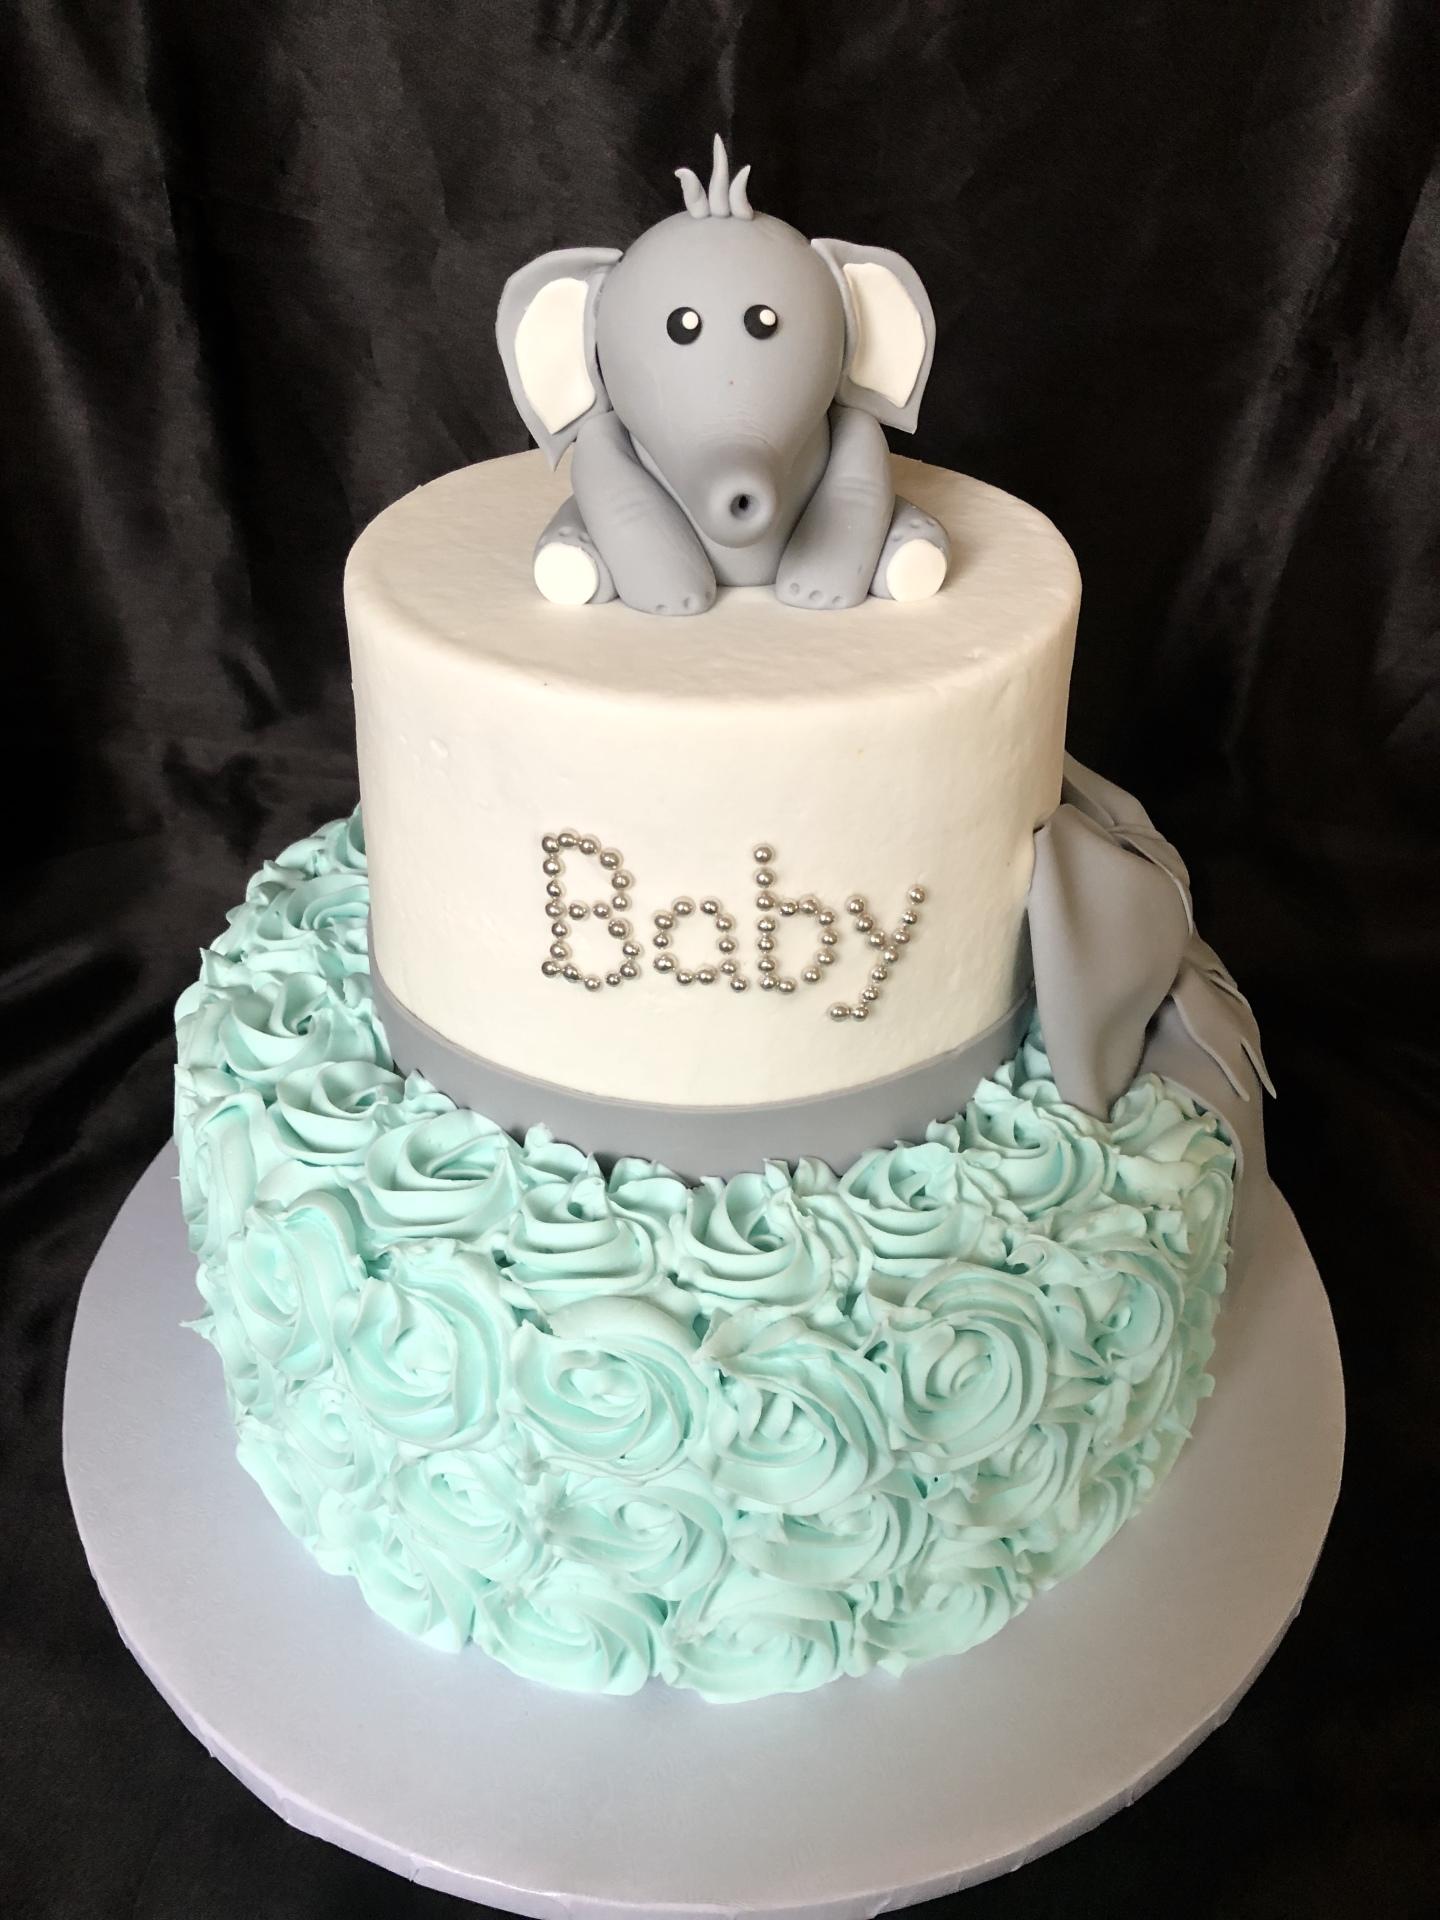 Baby elephant and turquoise rosettes